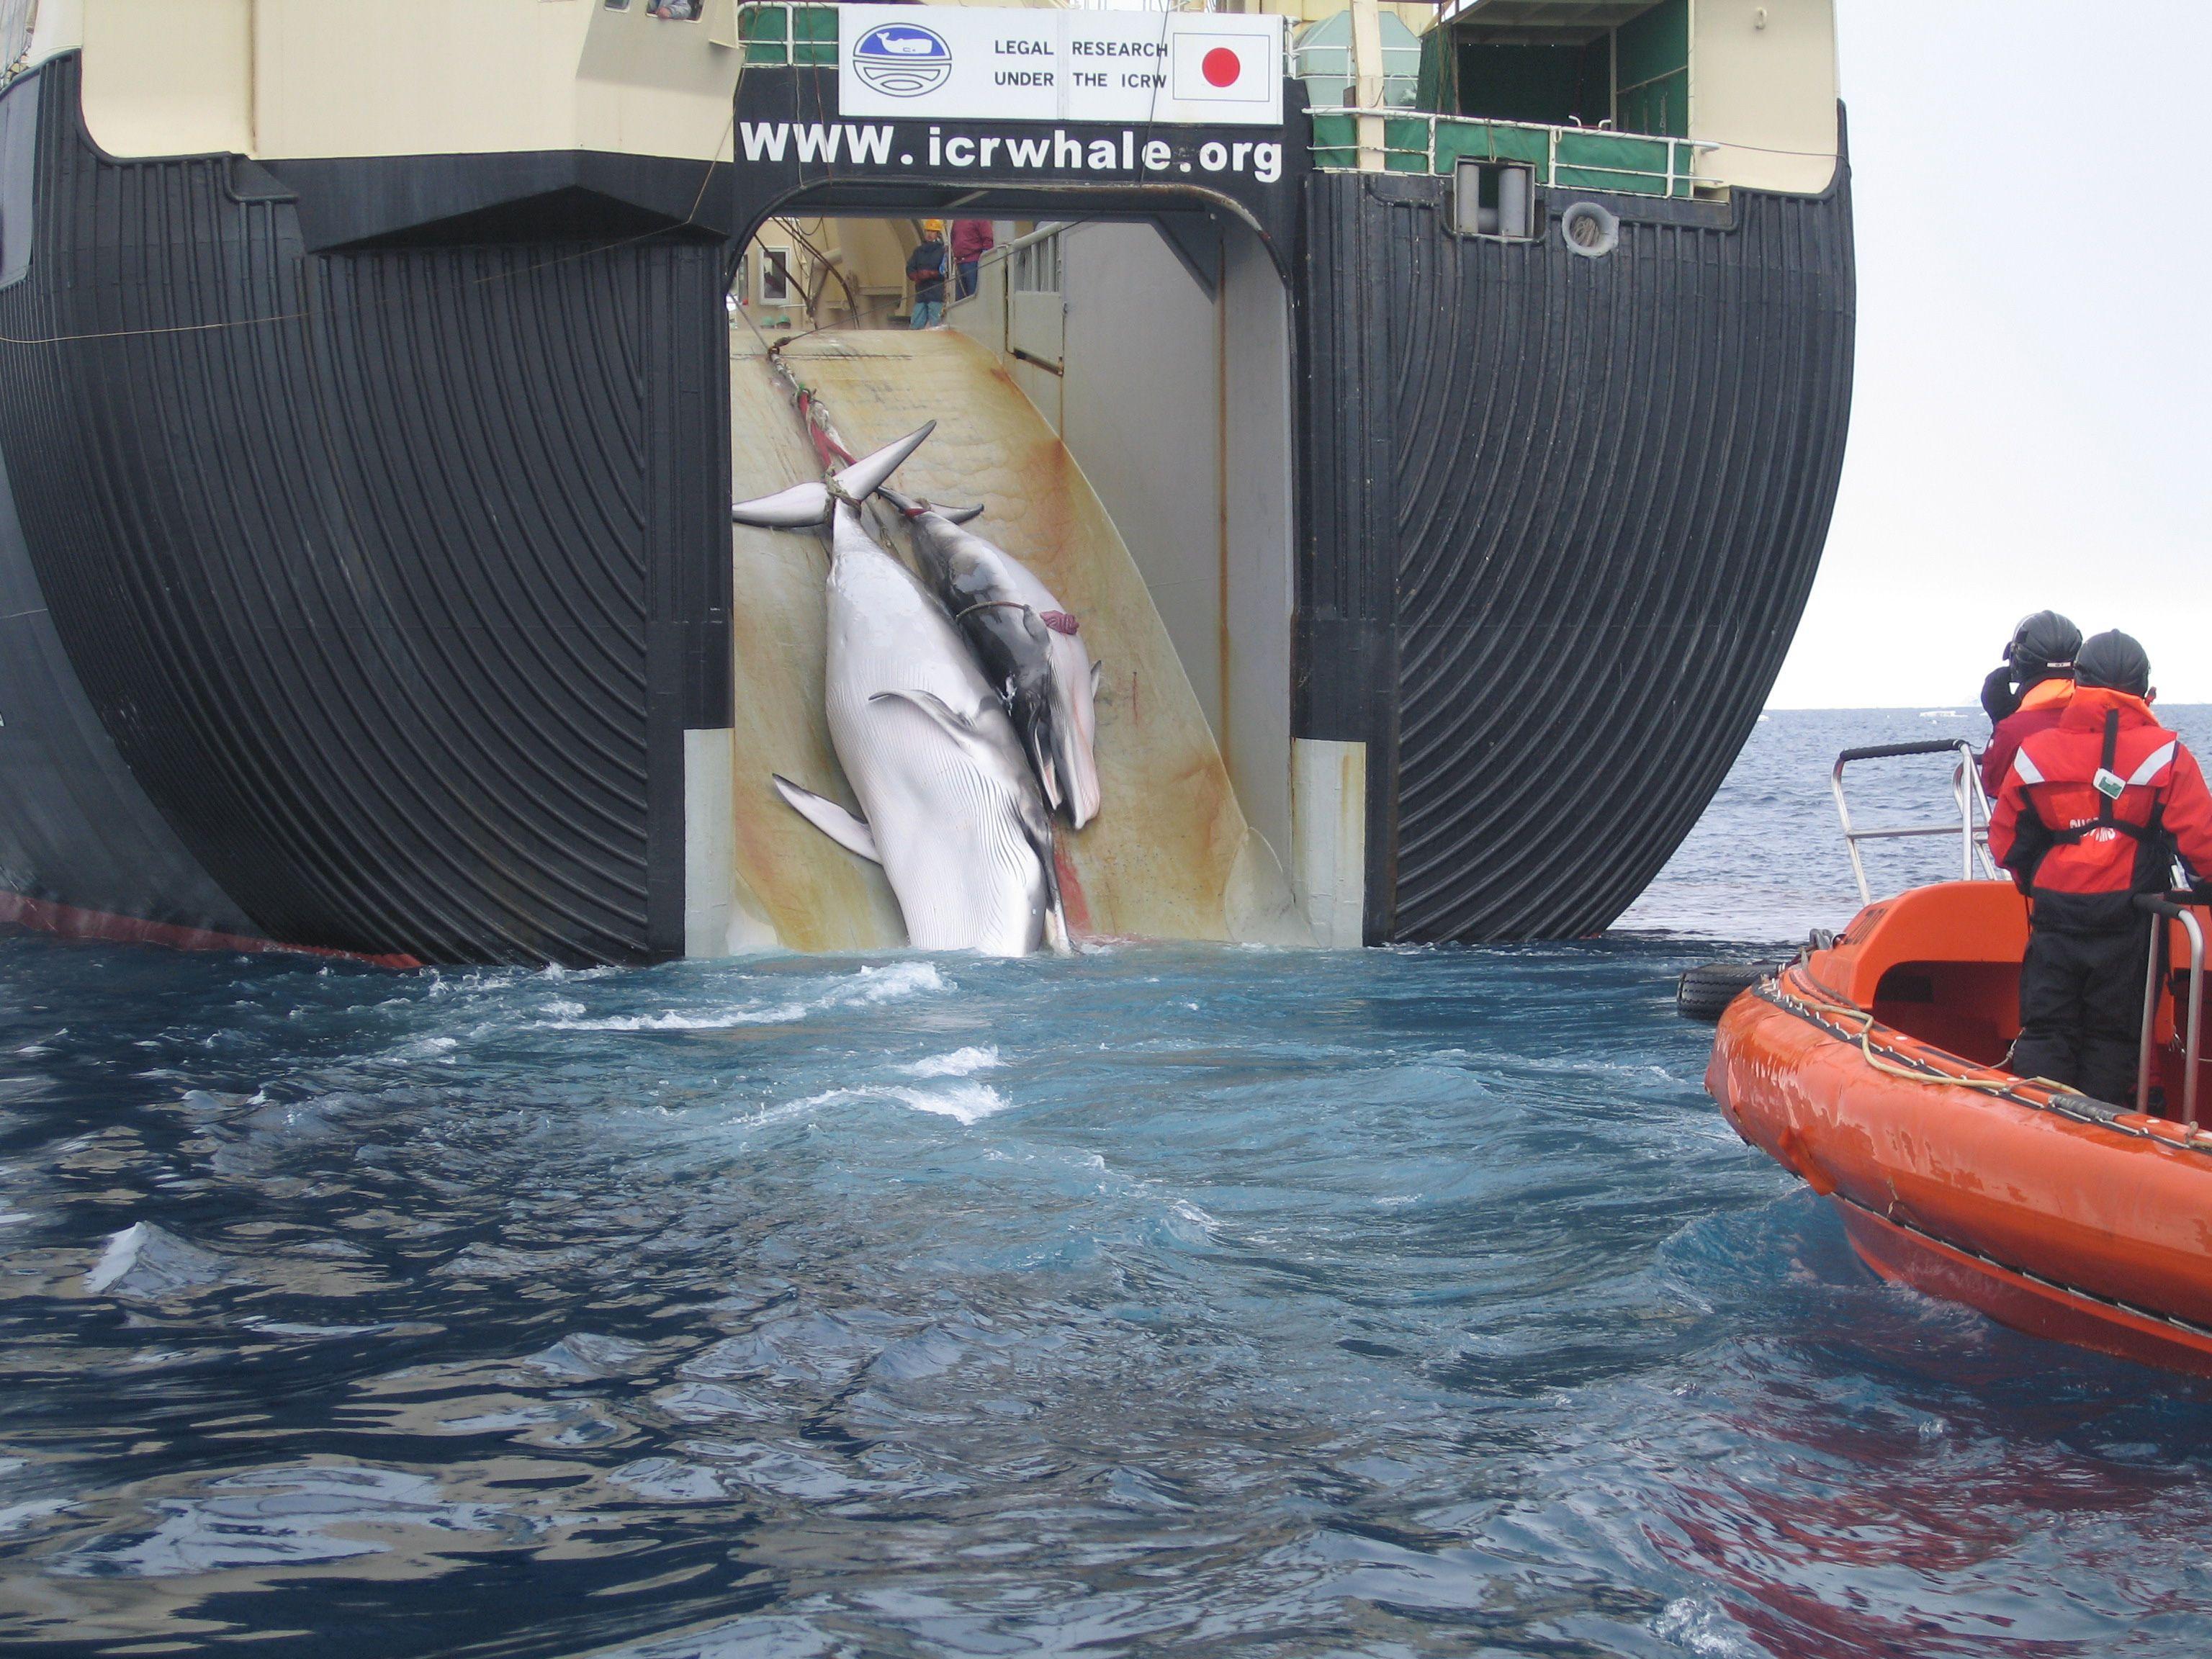 Japan whaling: Shocking photos show first kills in renewed